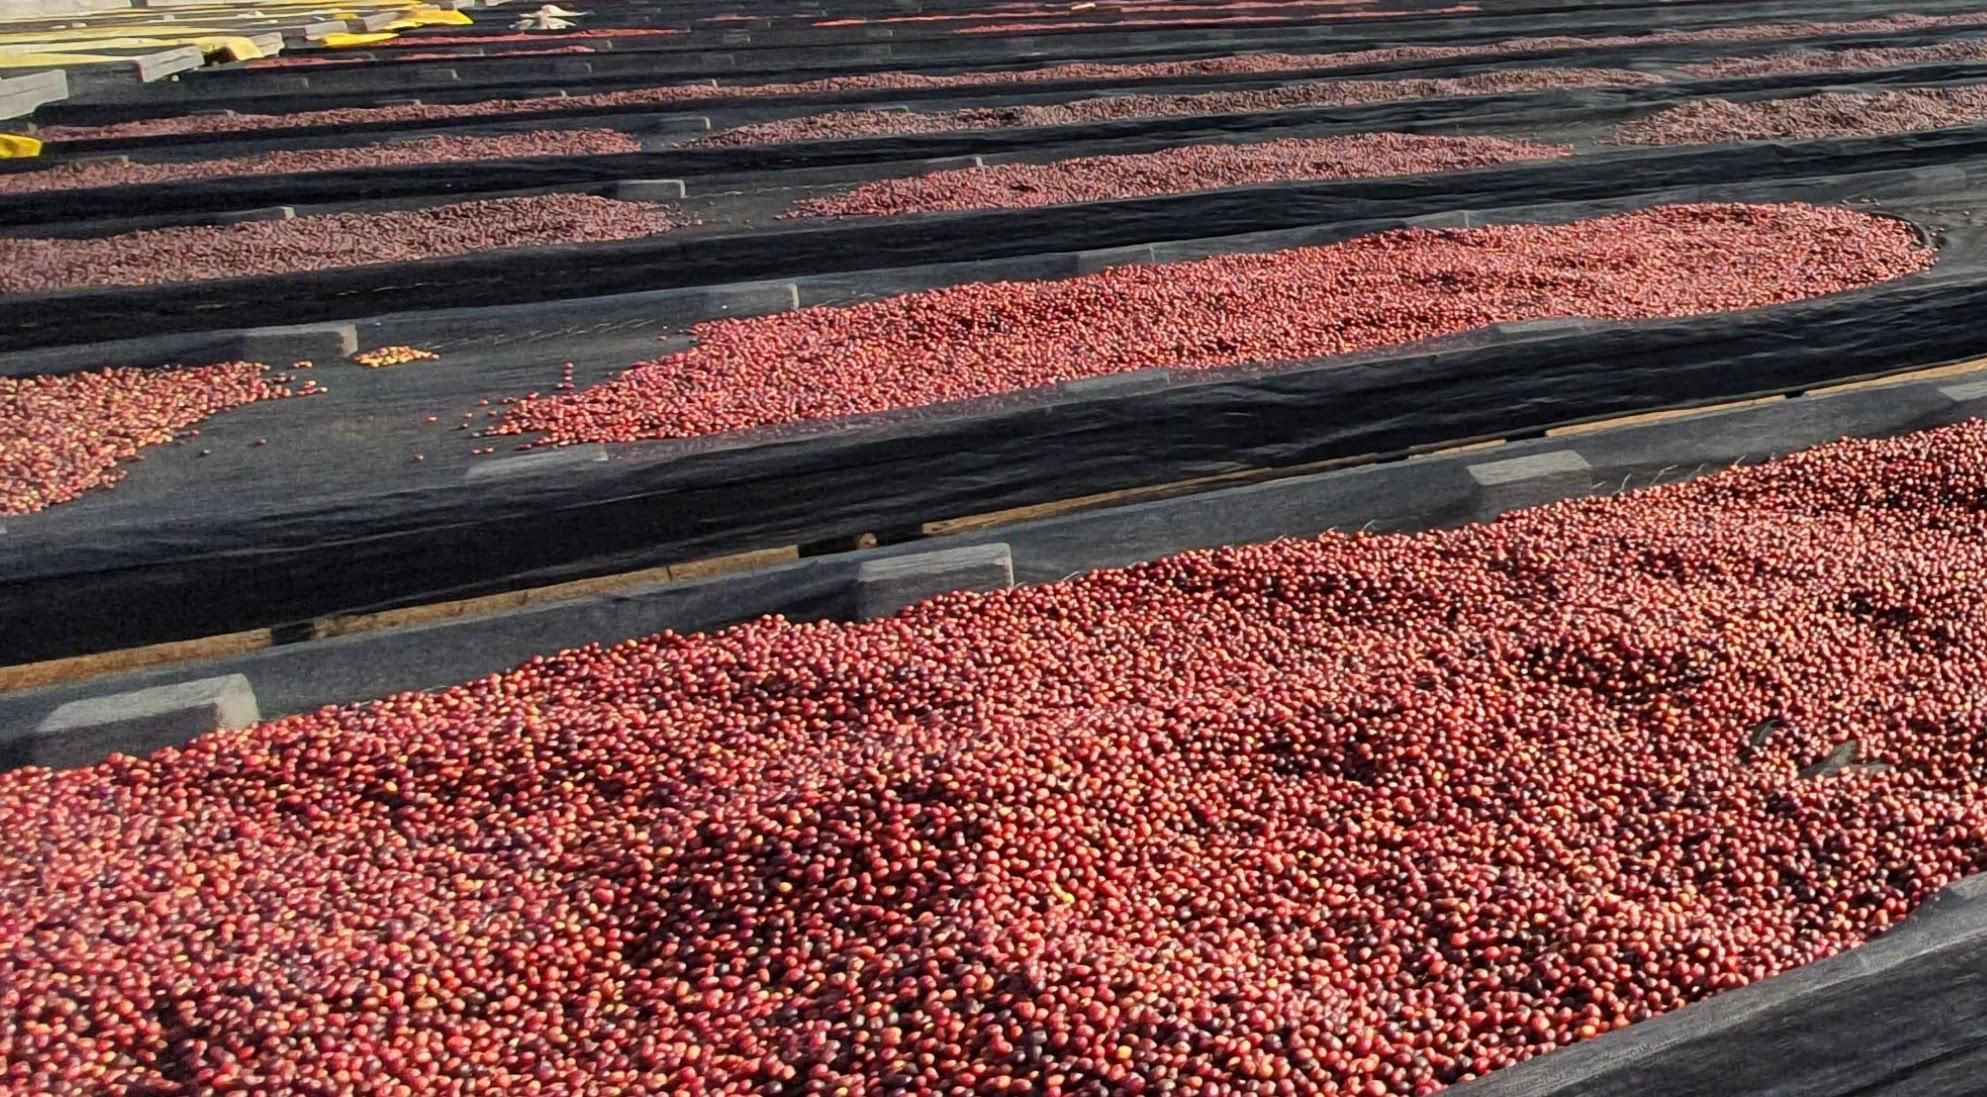 Uganda Raised Coffee Beds